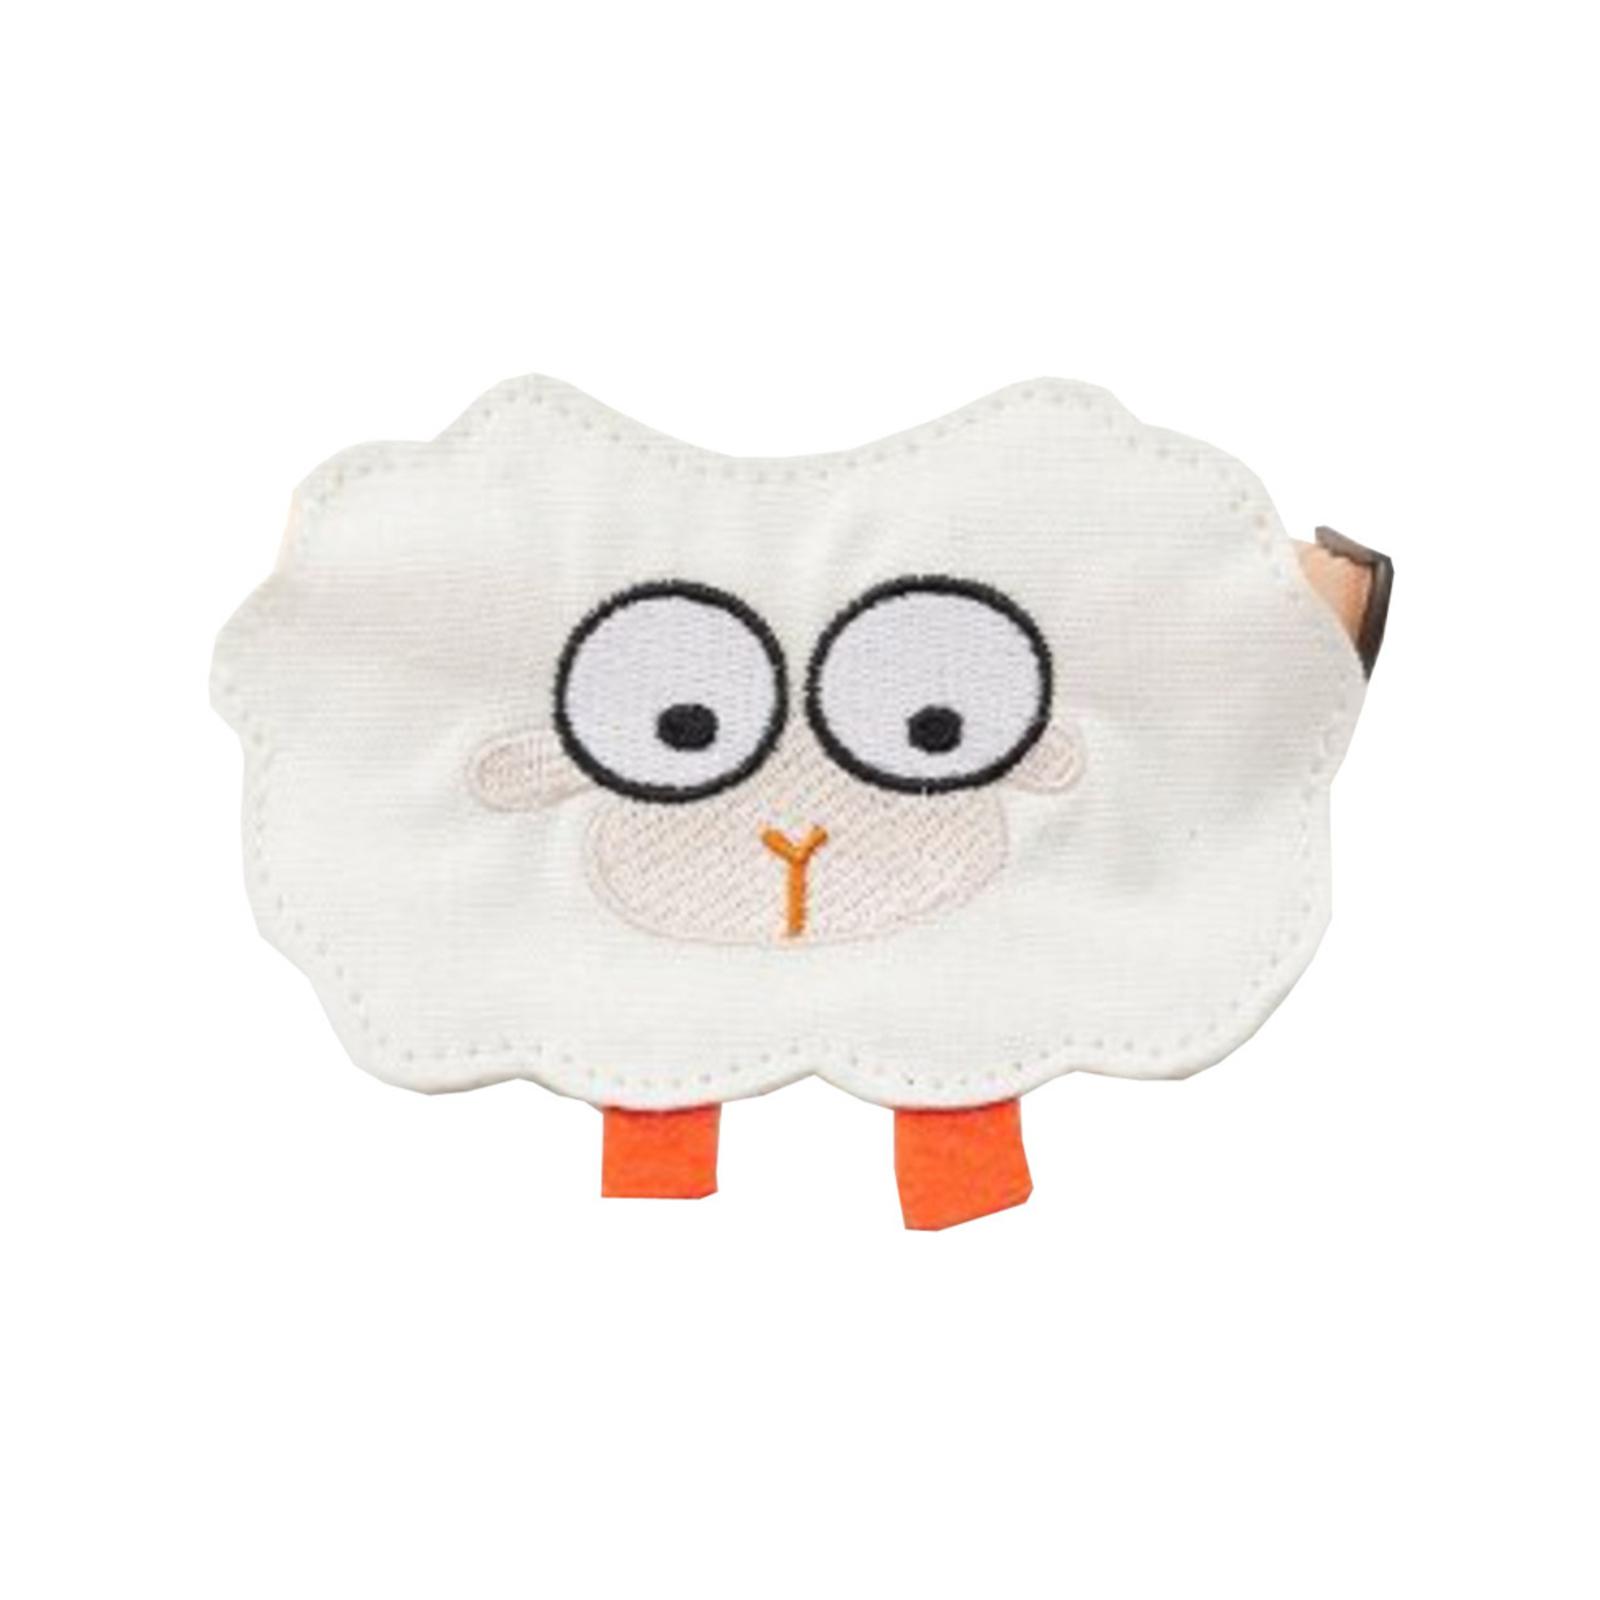 Petkit 12cm Adjustable Pet Saliva Towel/Bib Collar Wedding/Party Accessory Sheep